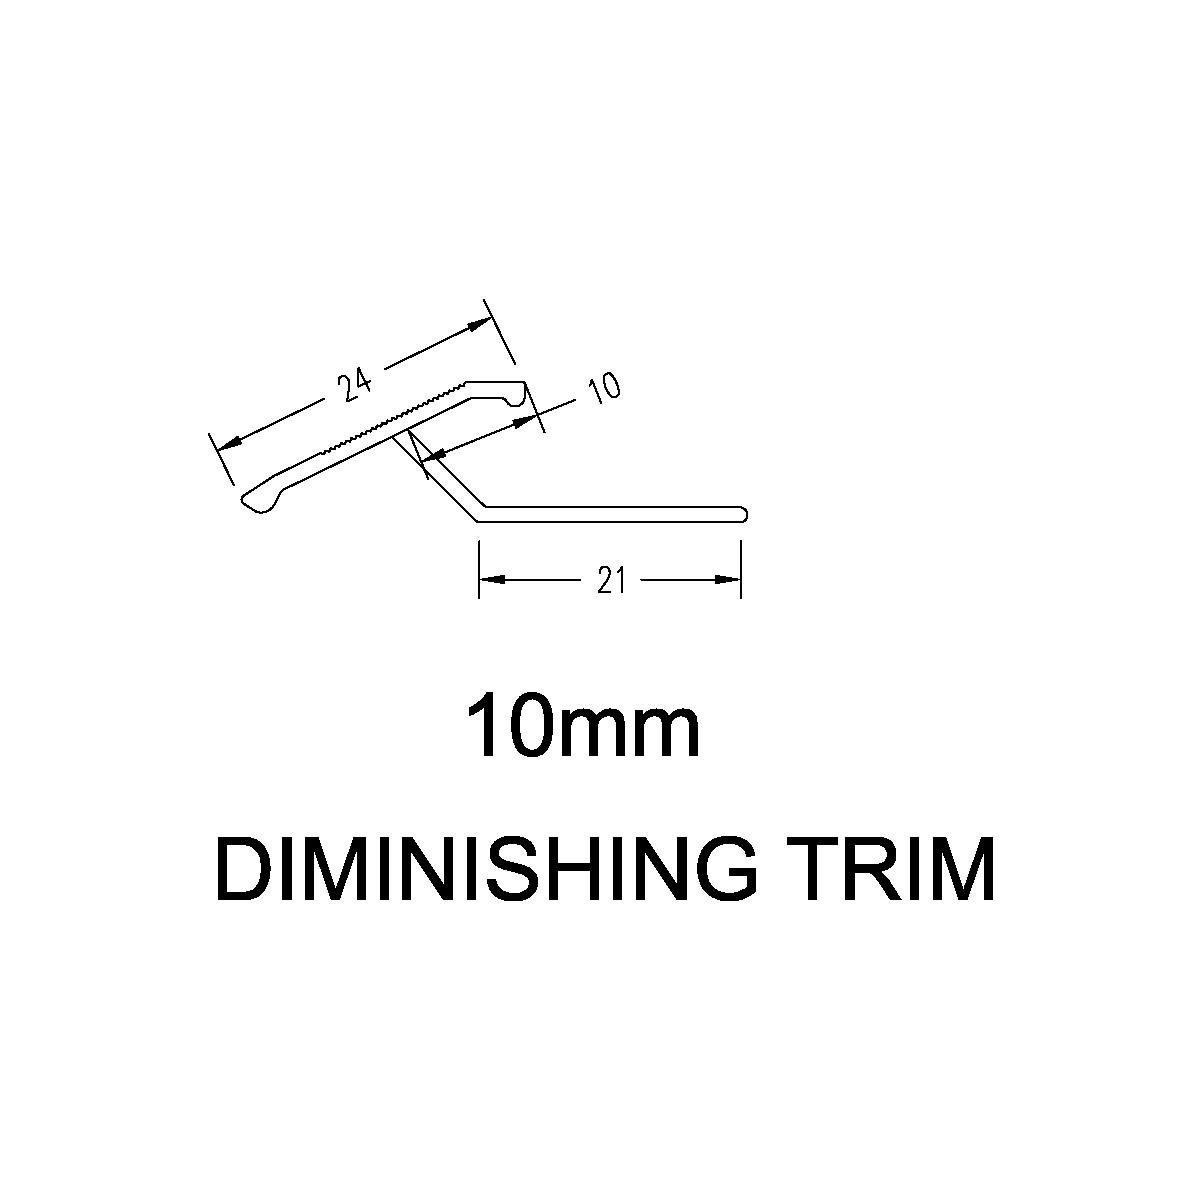 Diminishing Trim – 10mm